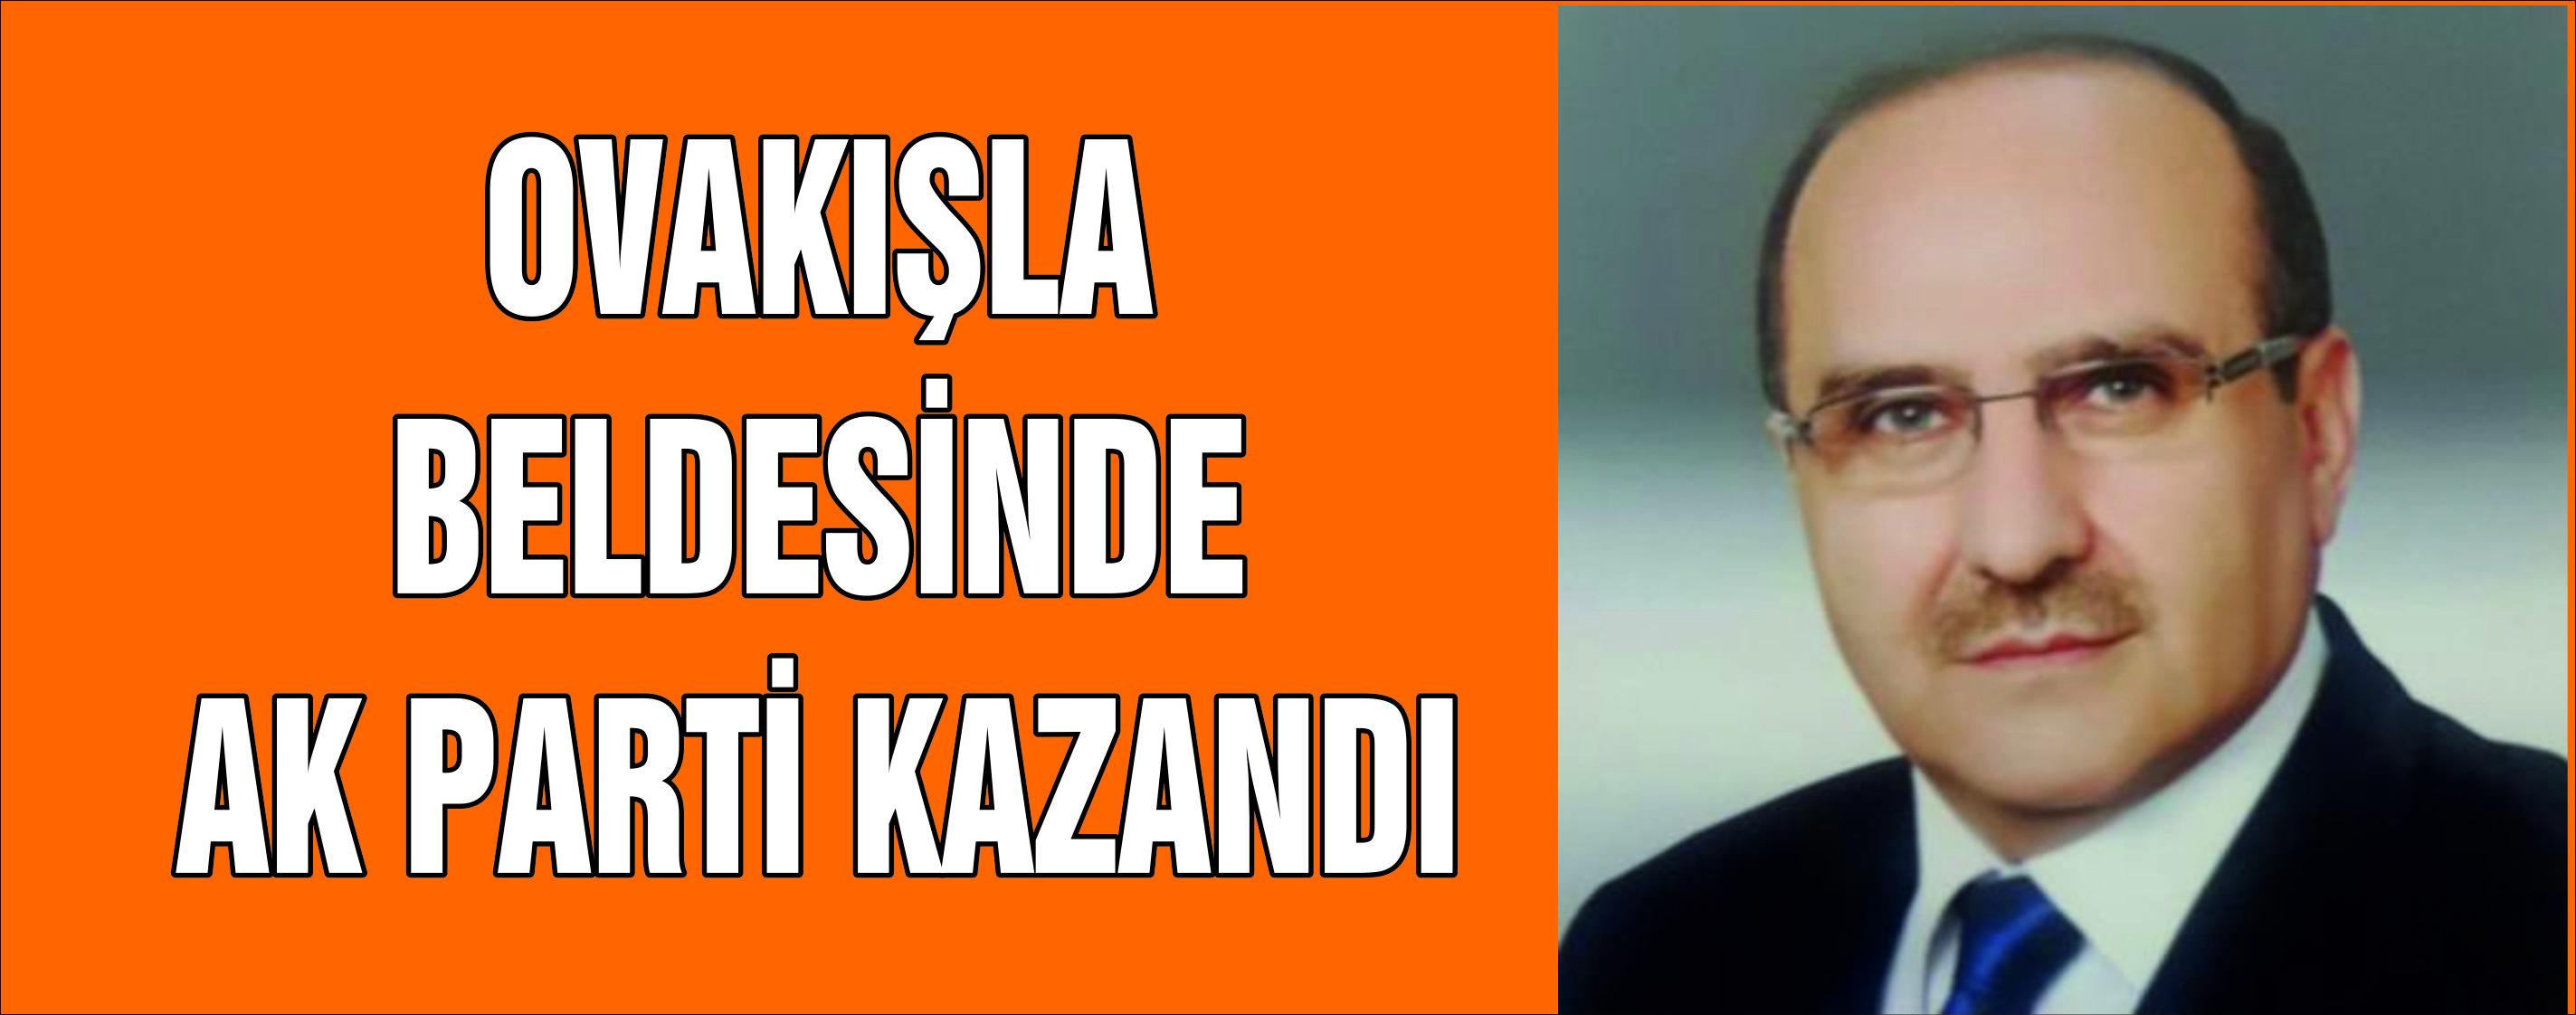 OVAKIŞLA BELDESİNDE AK PARTİ KAZANDI